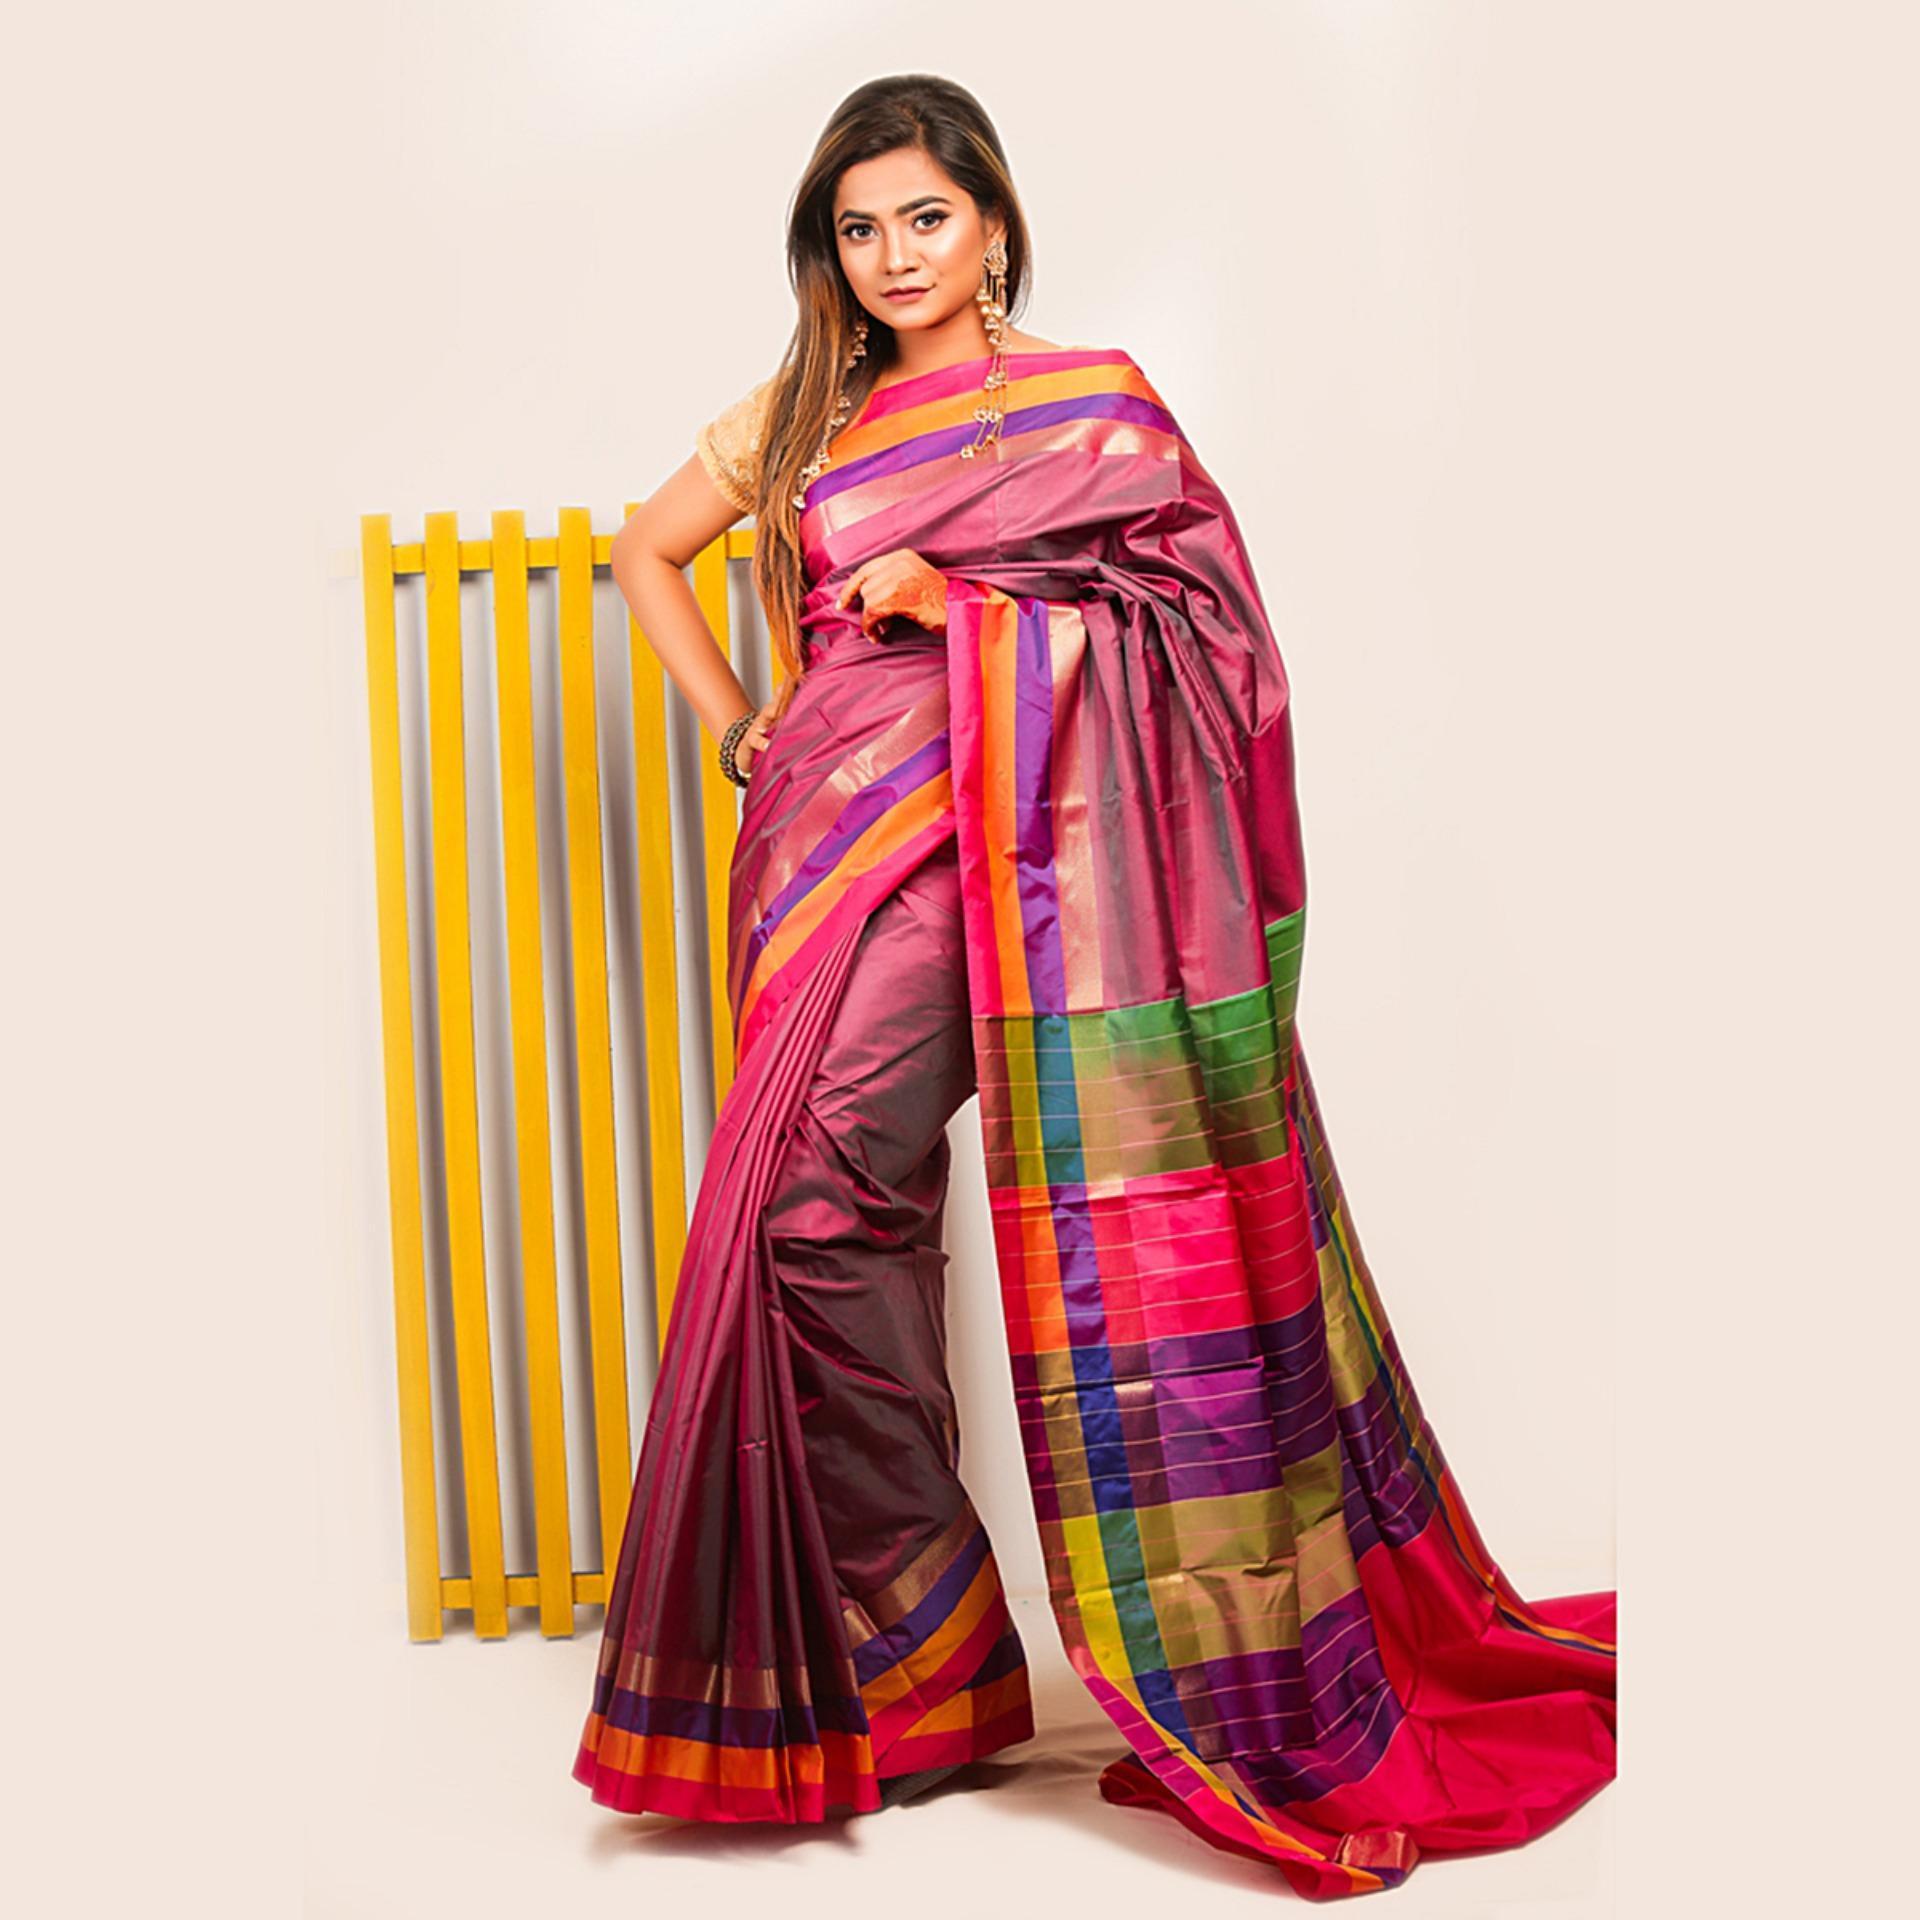 00b46cf62cbe63 Women's Silk Katan Saree With Unstitched Matching Blouse Piece- Multicolor